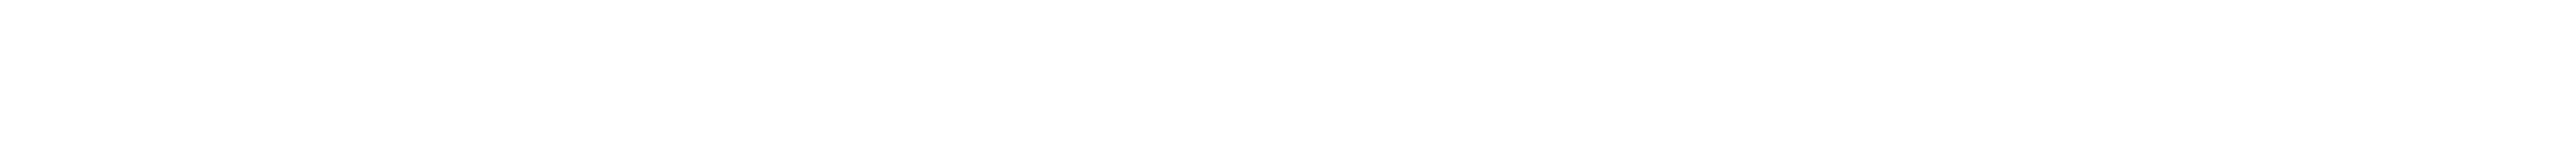 Mixed Branding Logo in All White- Q1-2